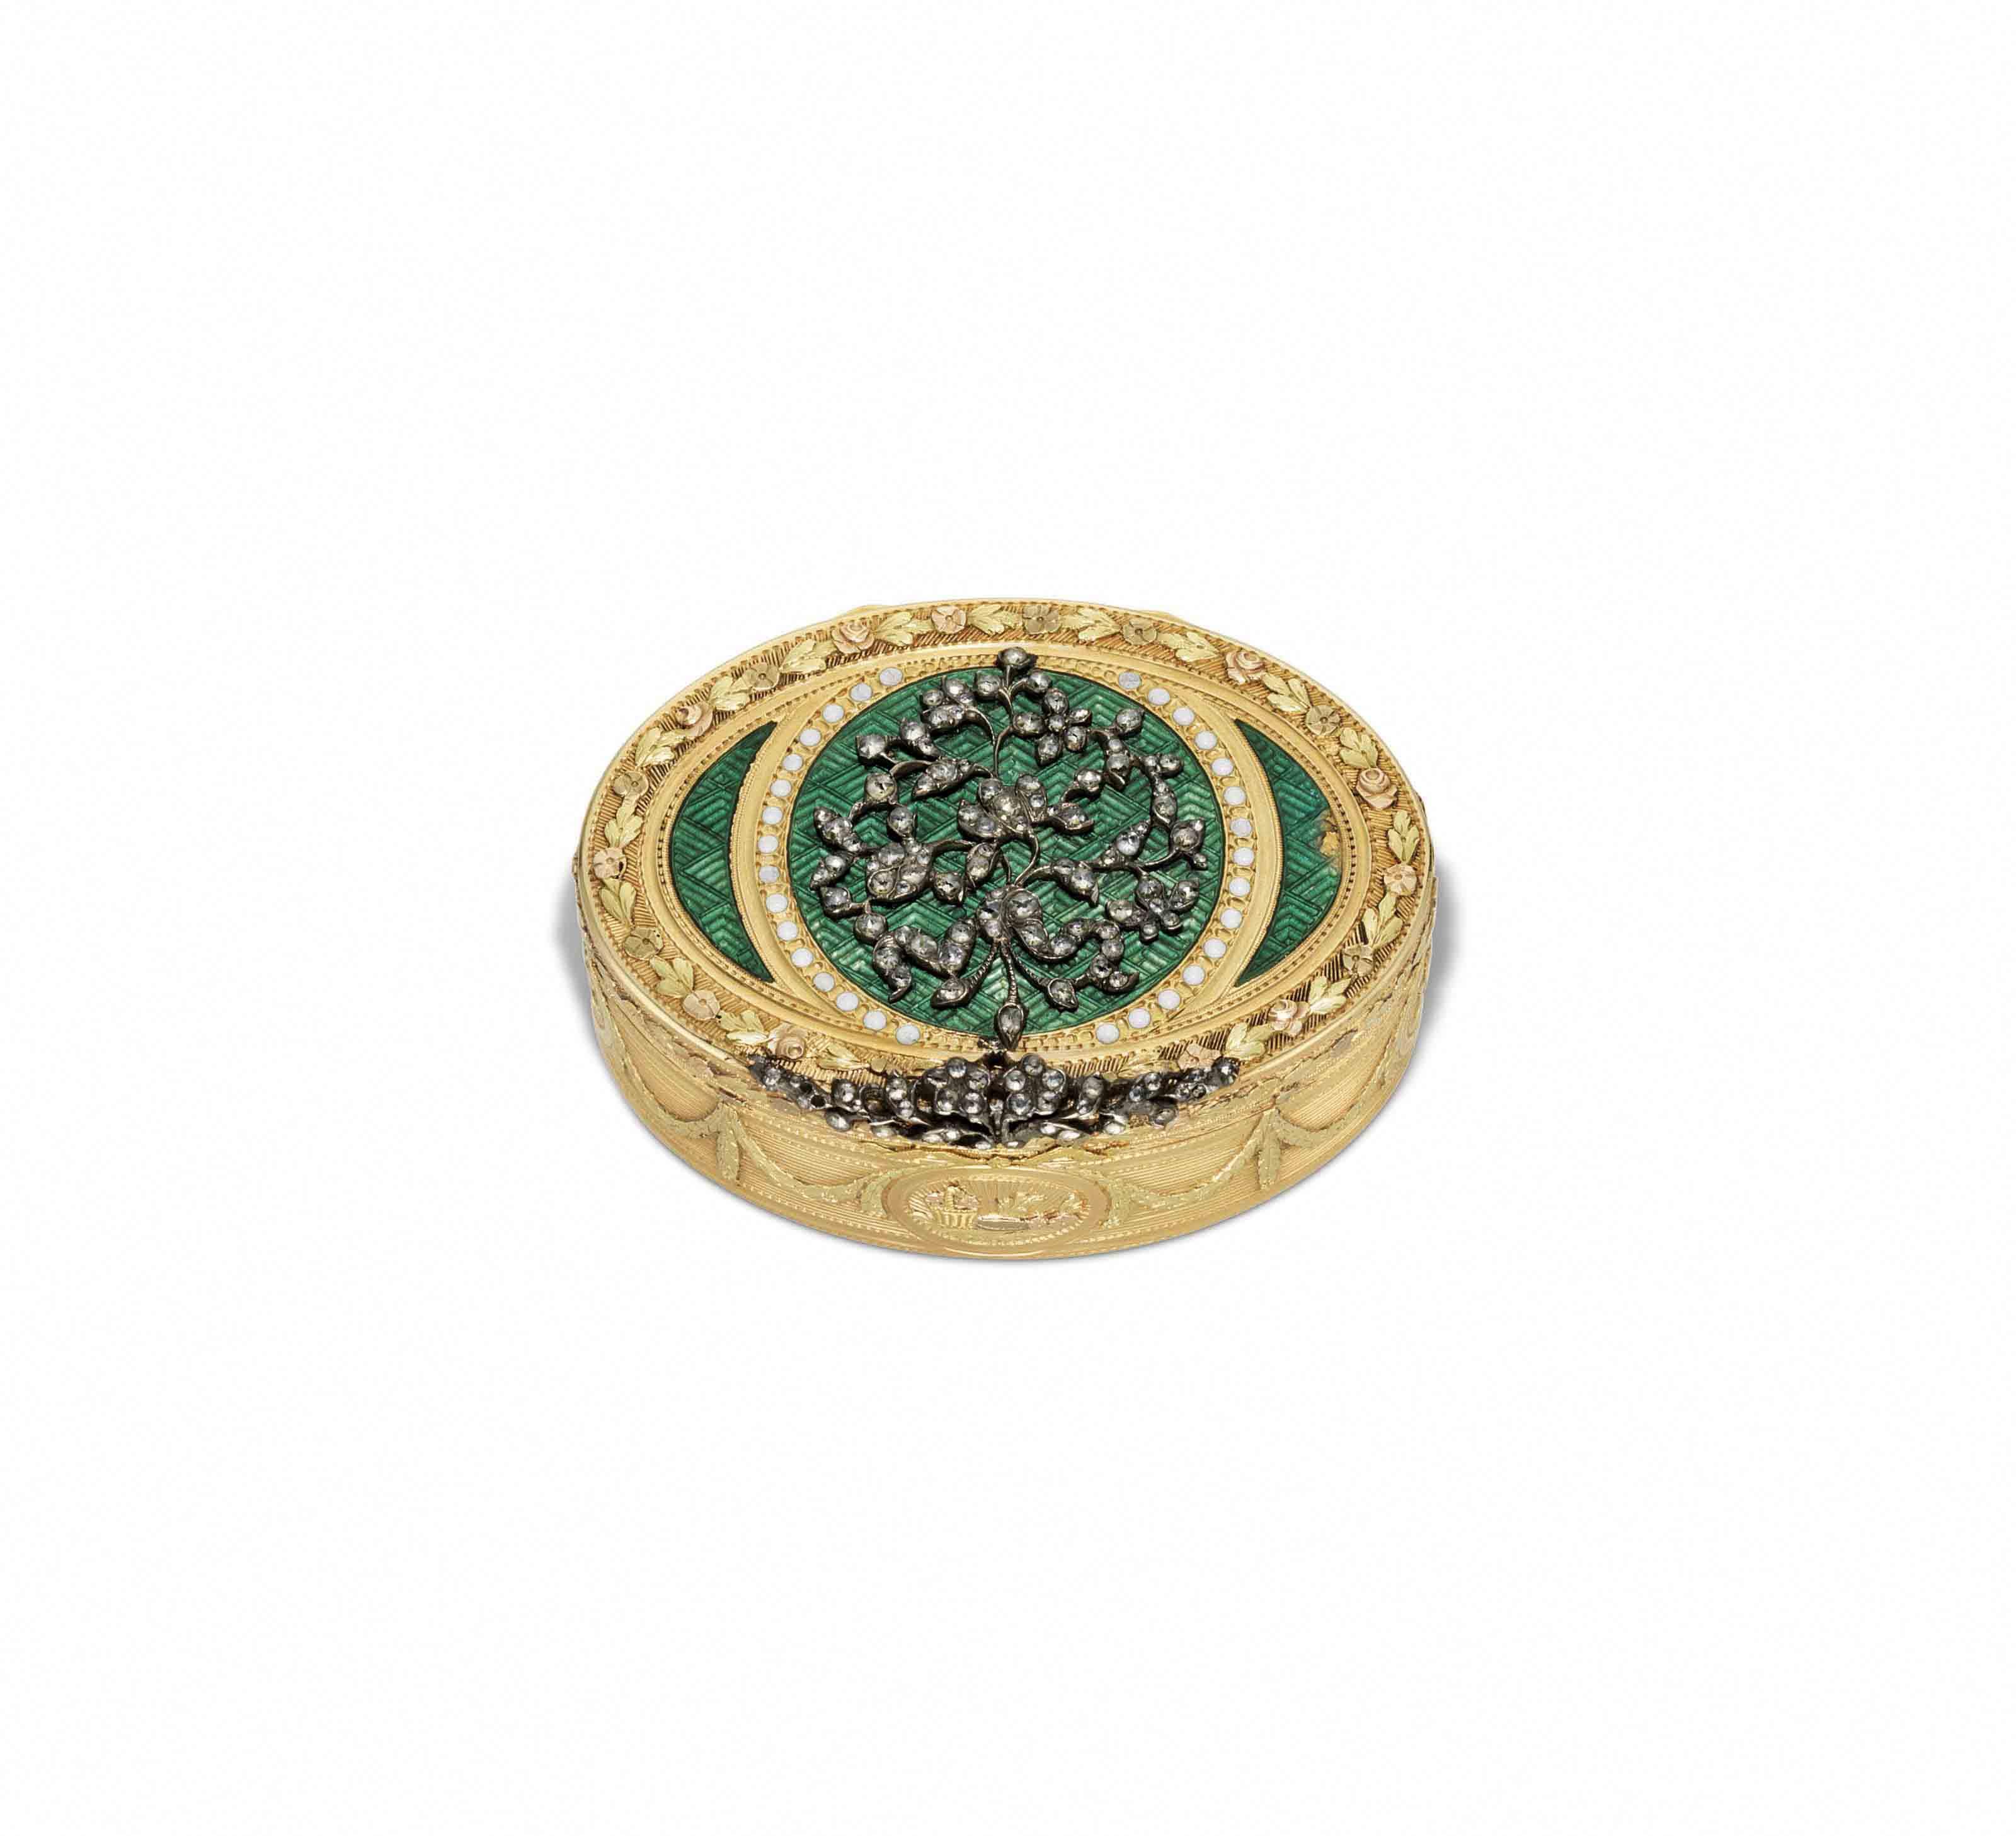 A SWISS JEWELLED ENAMELLED VARI-COLOUR GOLD SNUFF-BOX